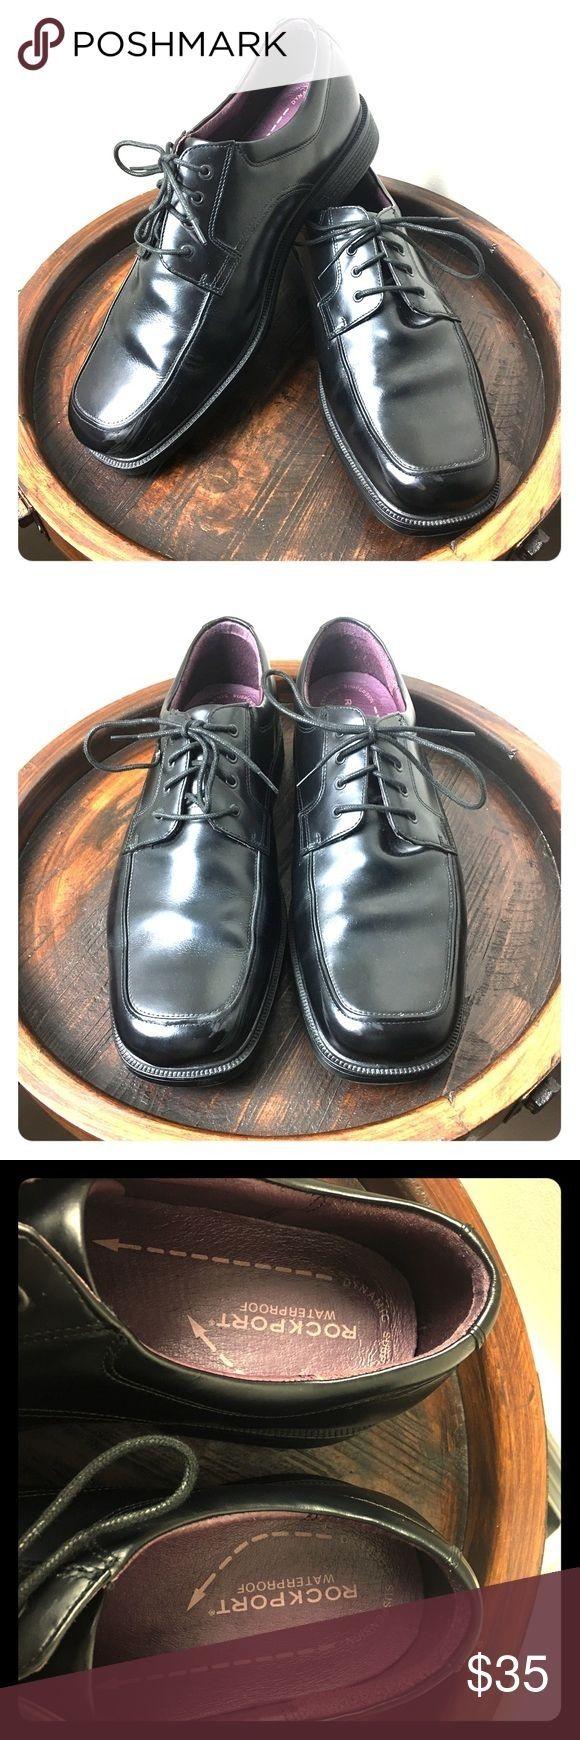 Top Ten Most Comfortable Dress Shoes For Men - Current Dress Style - Current Dress Style